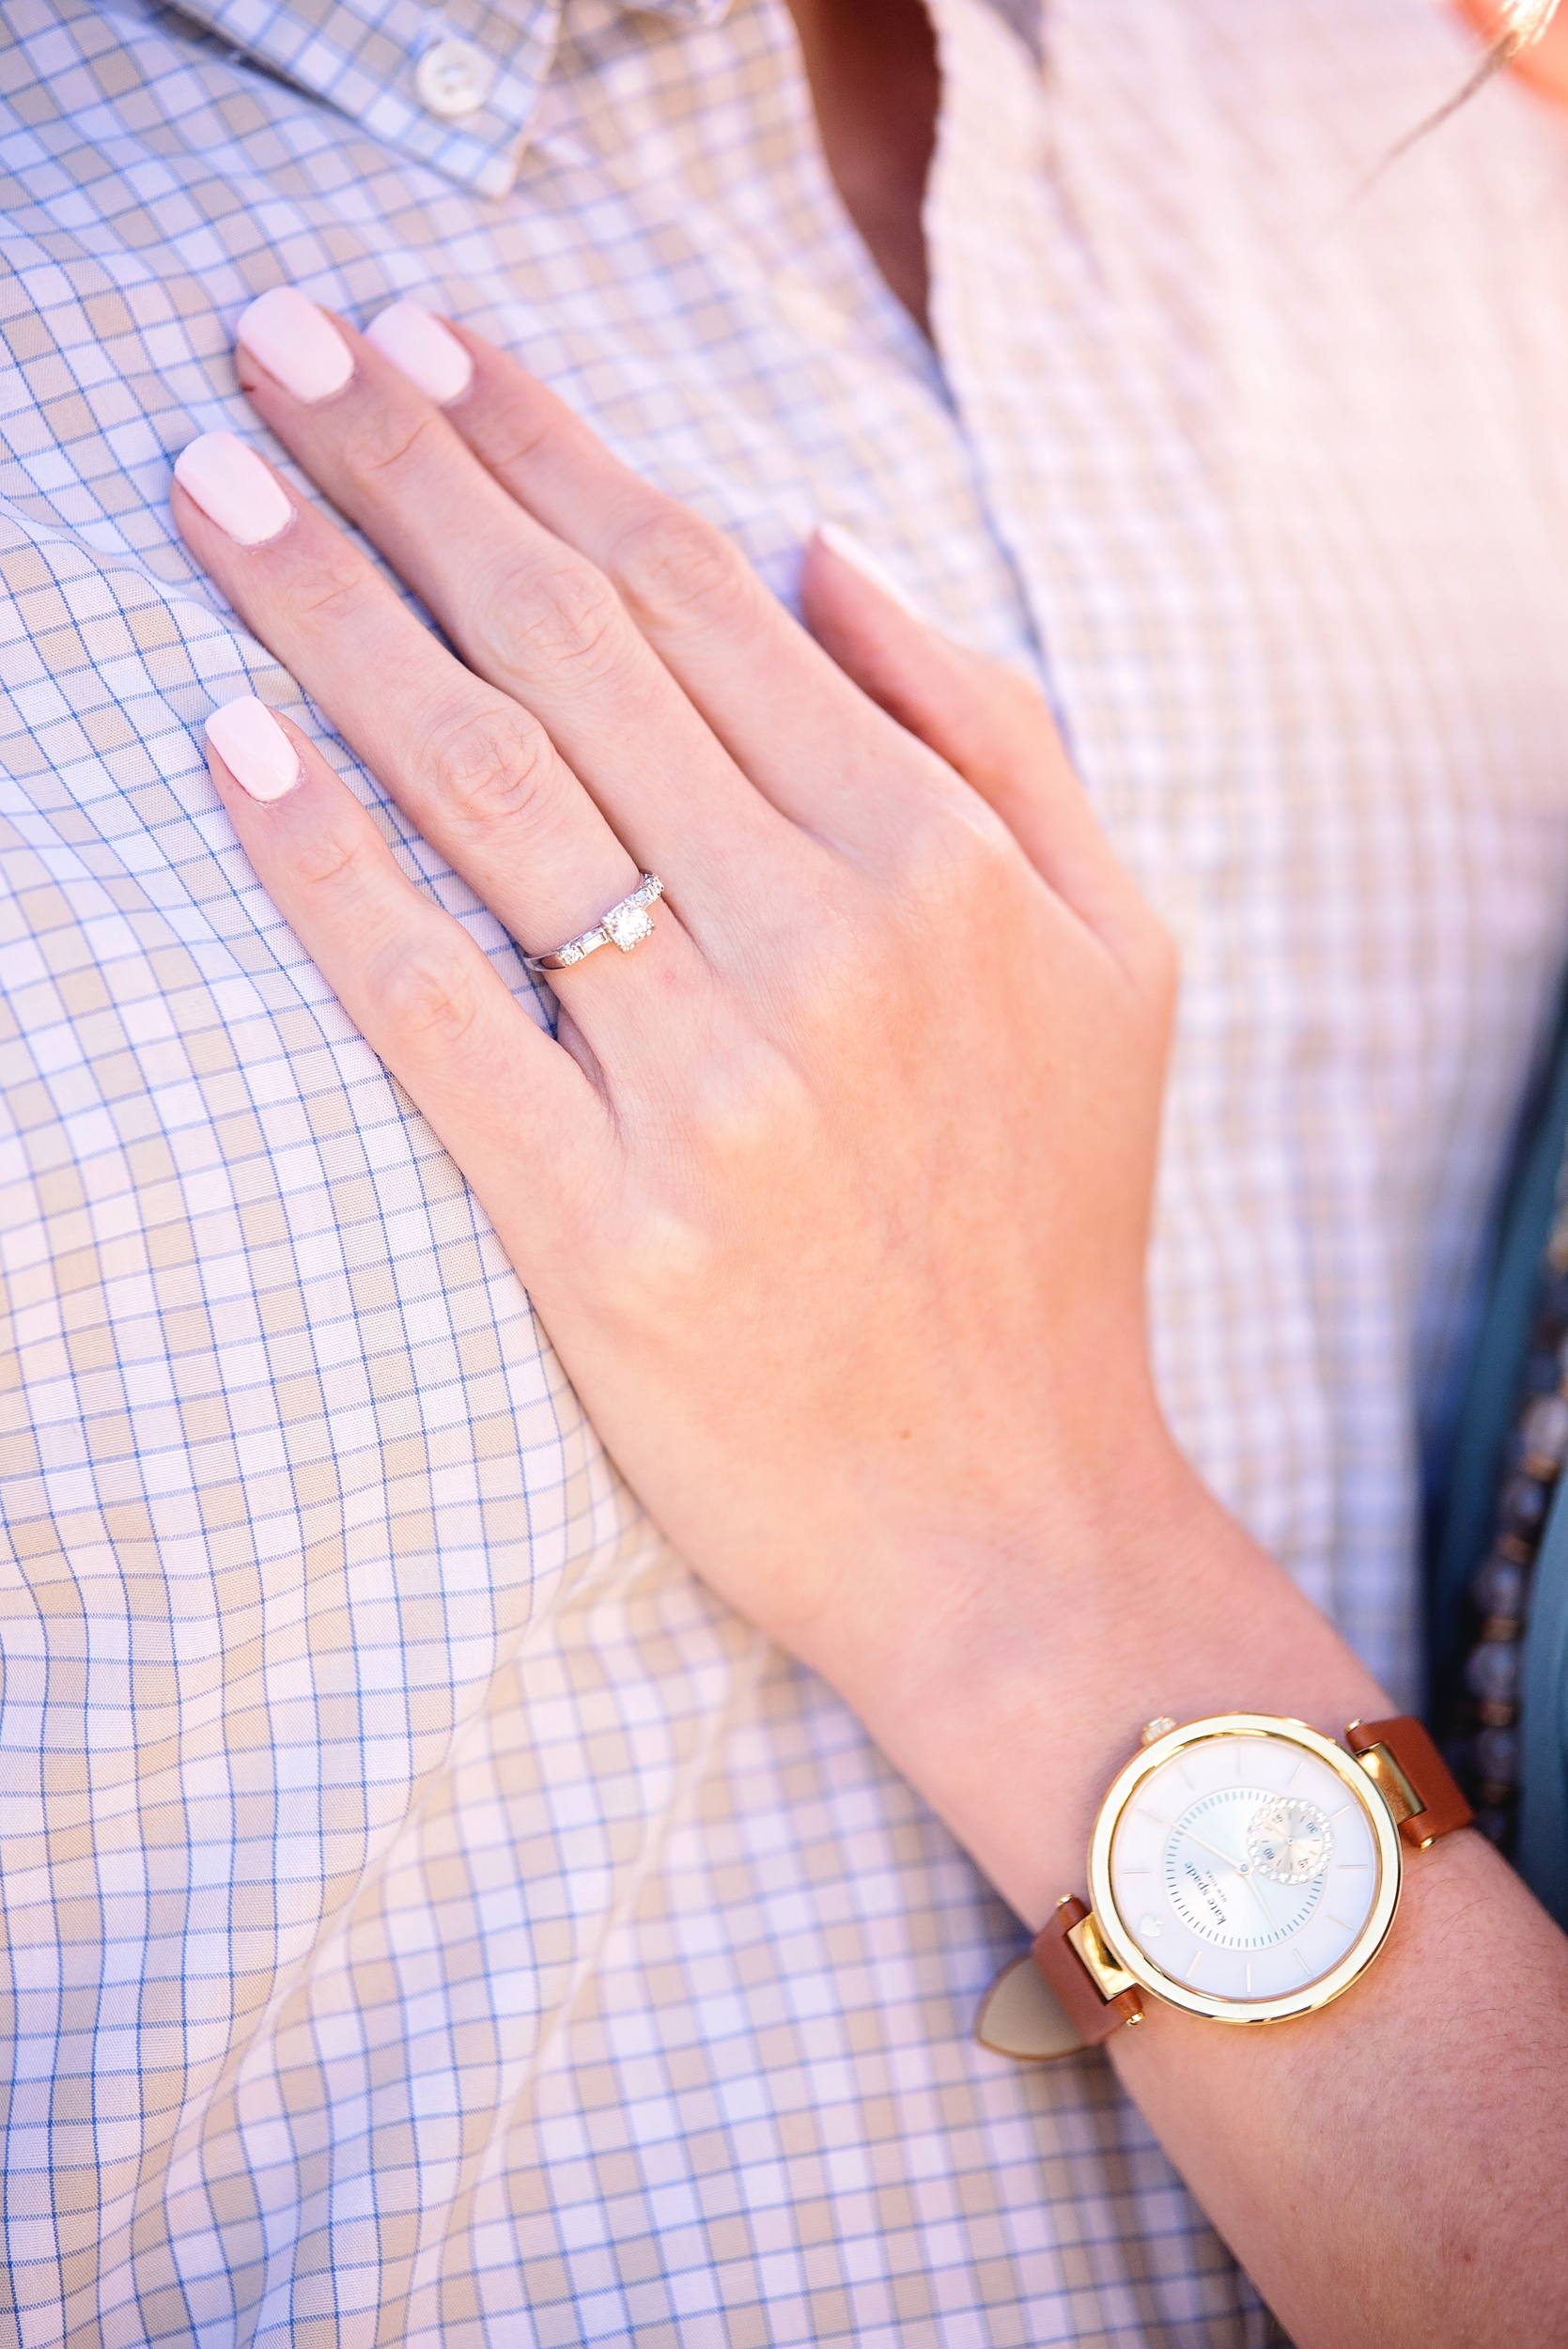 Proposal/Engagement in Santa Barbara, California. Engagement Photos ...